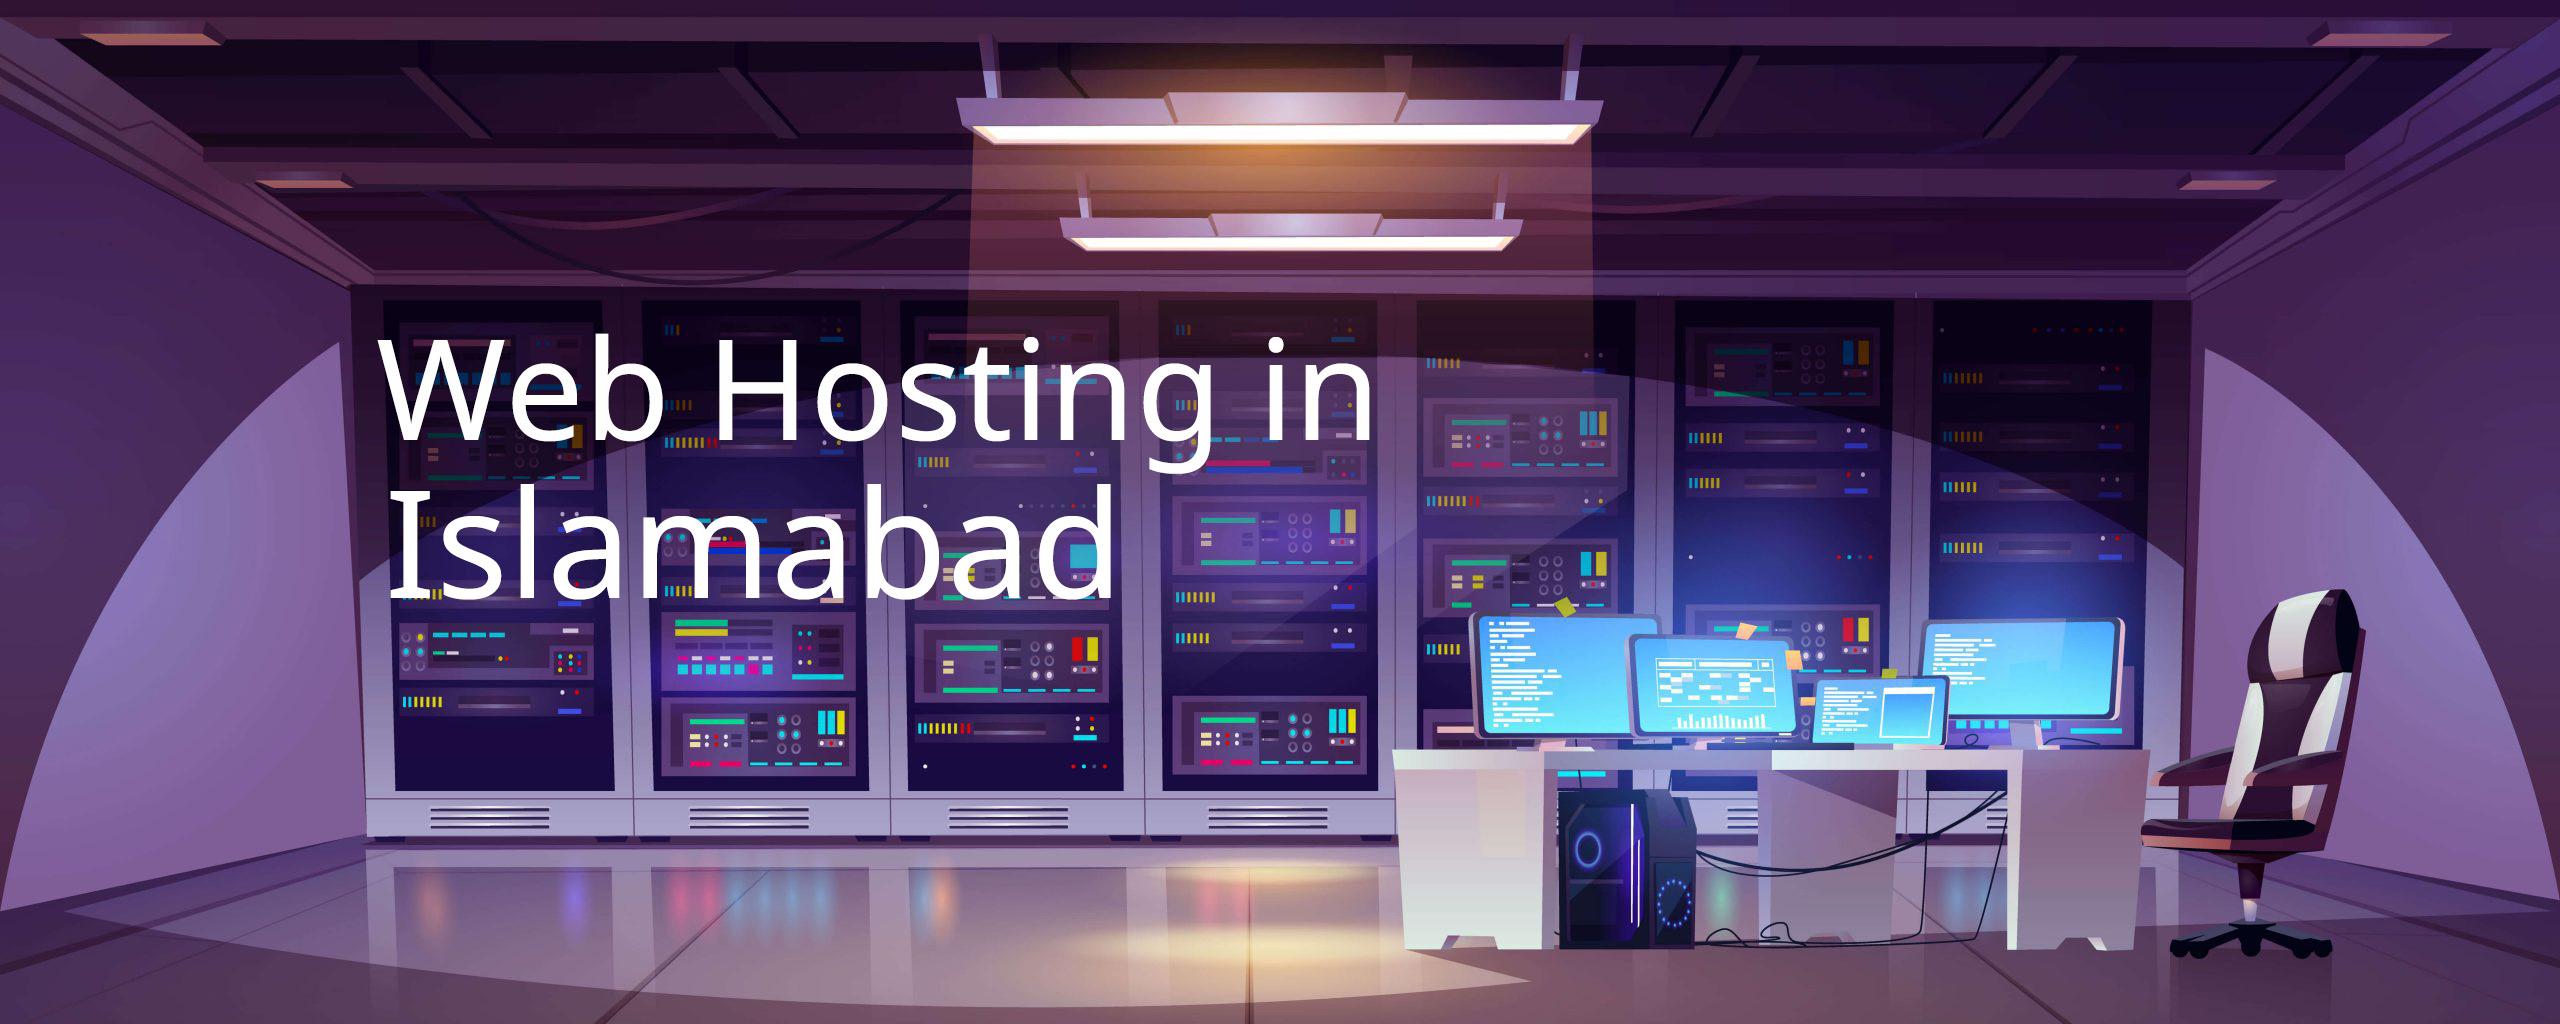 web-hosting-in-islamabad-madaar.net